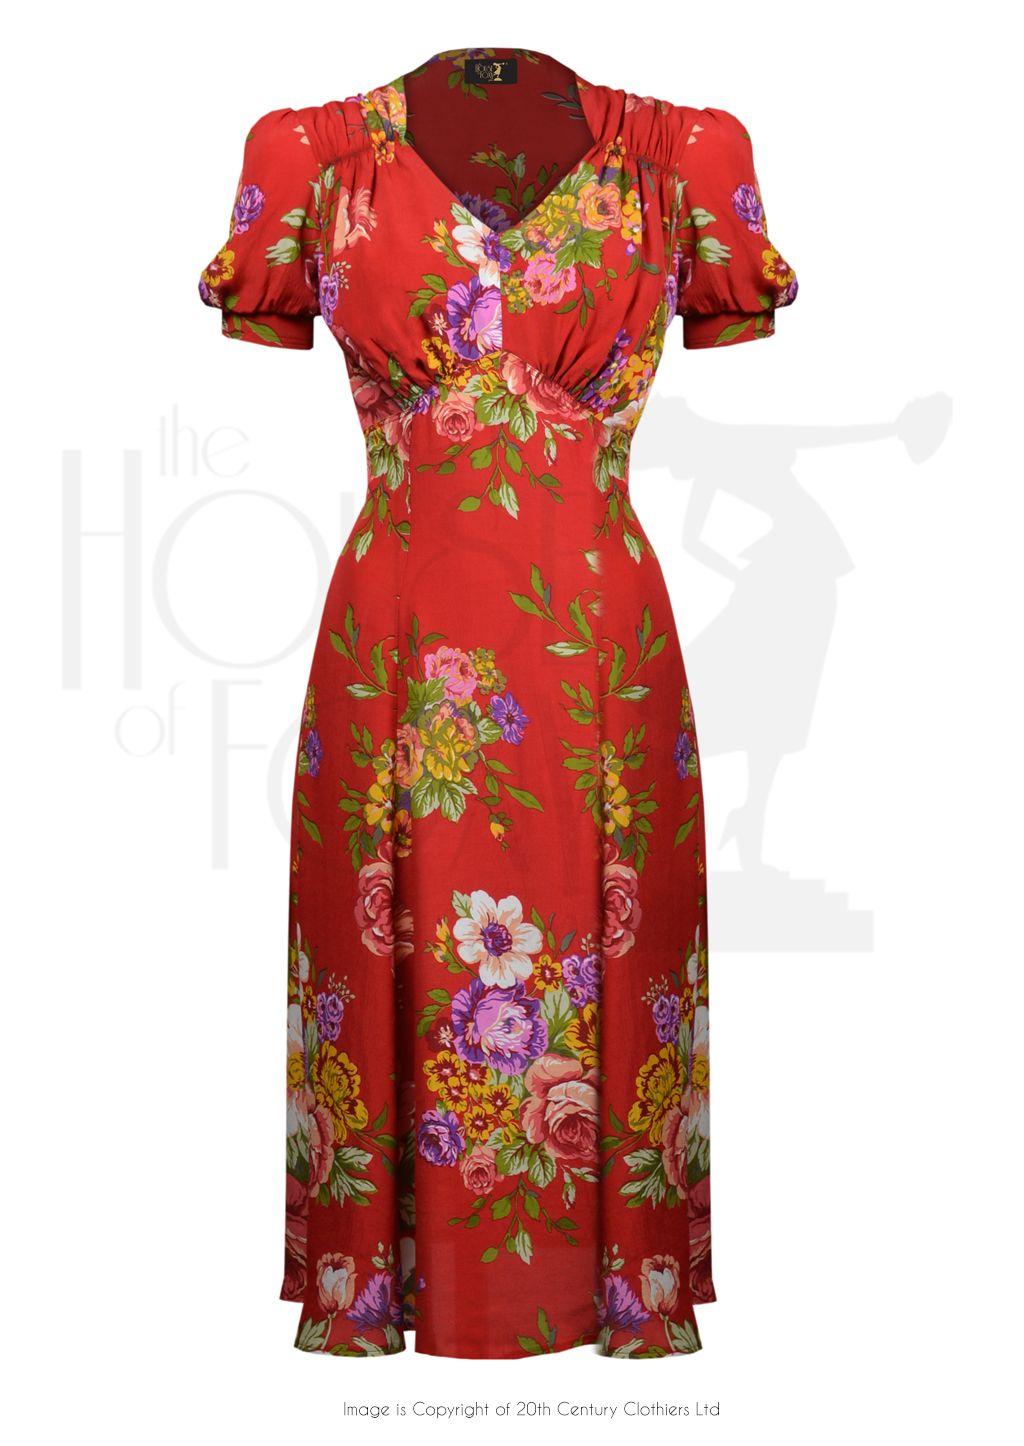 8a40ca81ba1 1940s Tea Dance Dress - Crimson Dreams £119.00 AT Vintagedancer.com